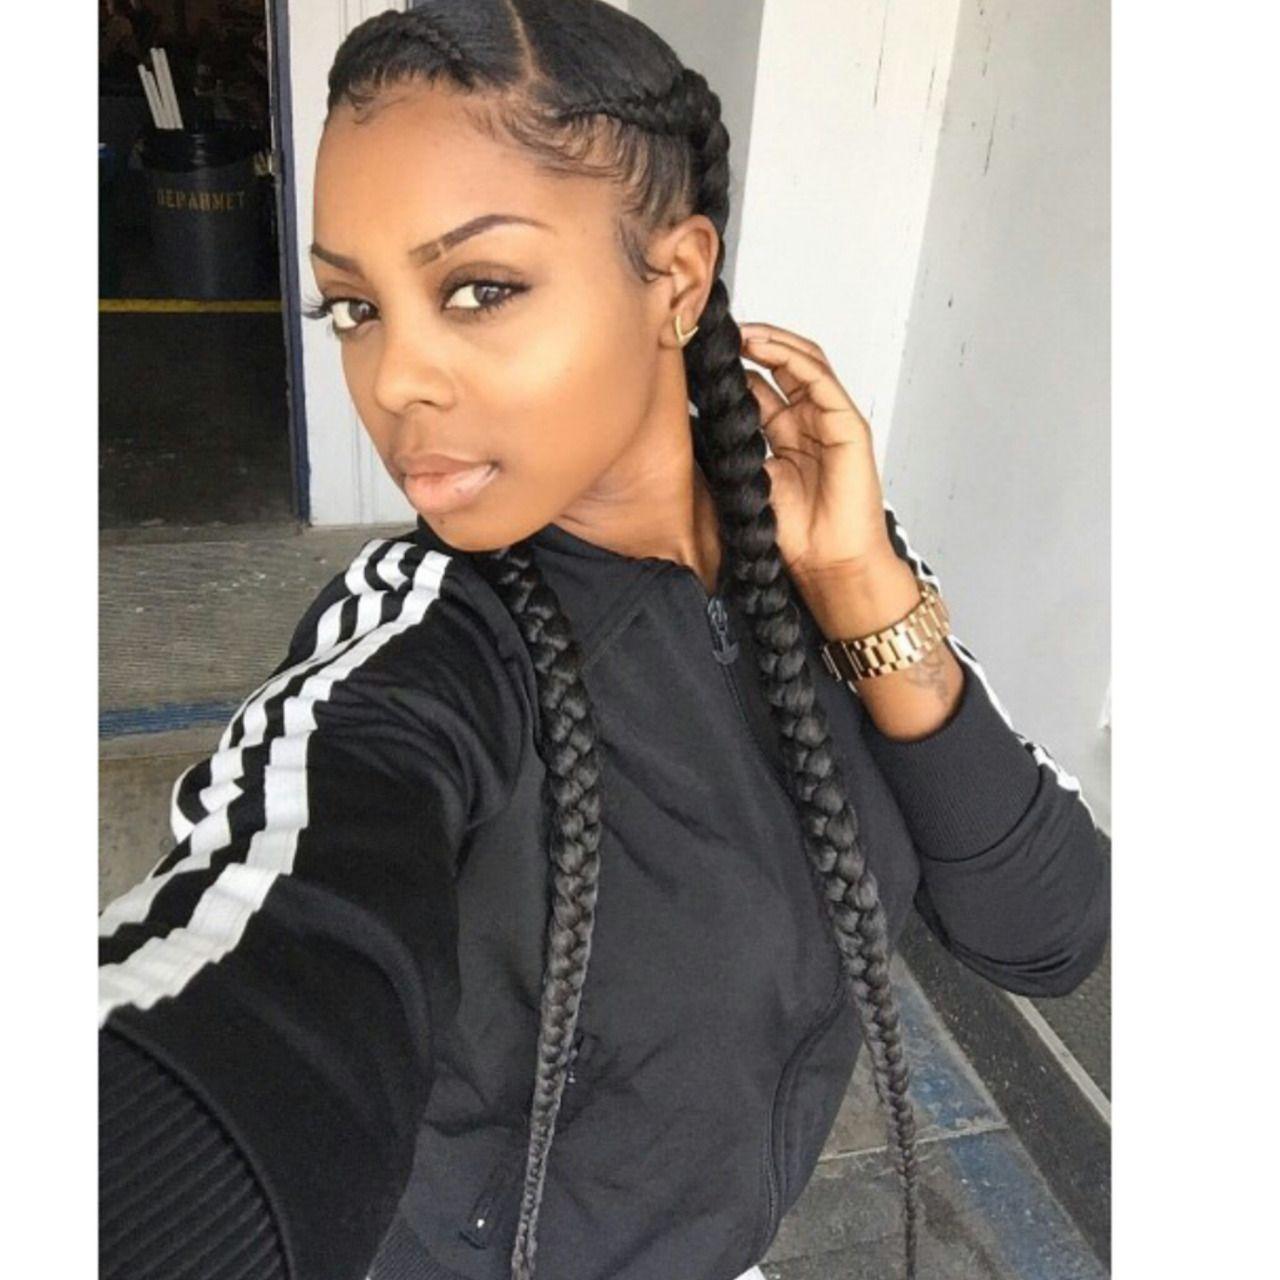 Blackgirlsclub Two Braids Style Two Braids Hairstyle Black Women Two Braid Hairstyles